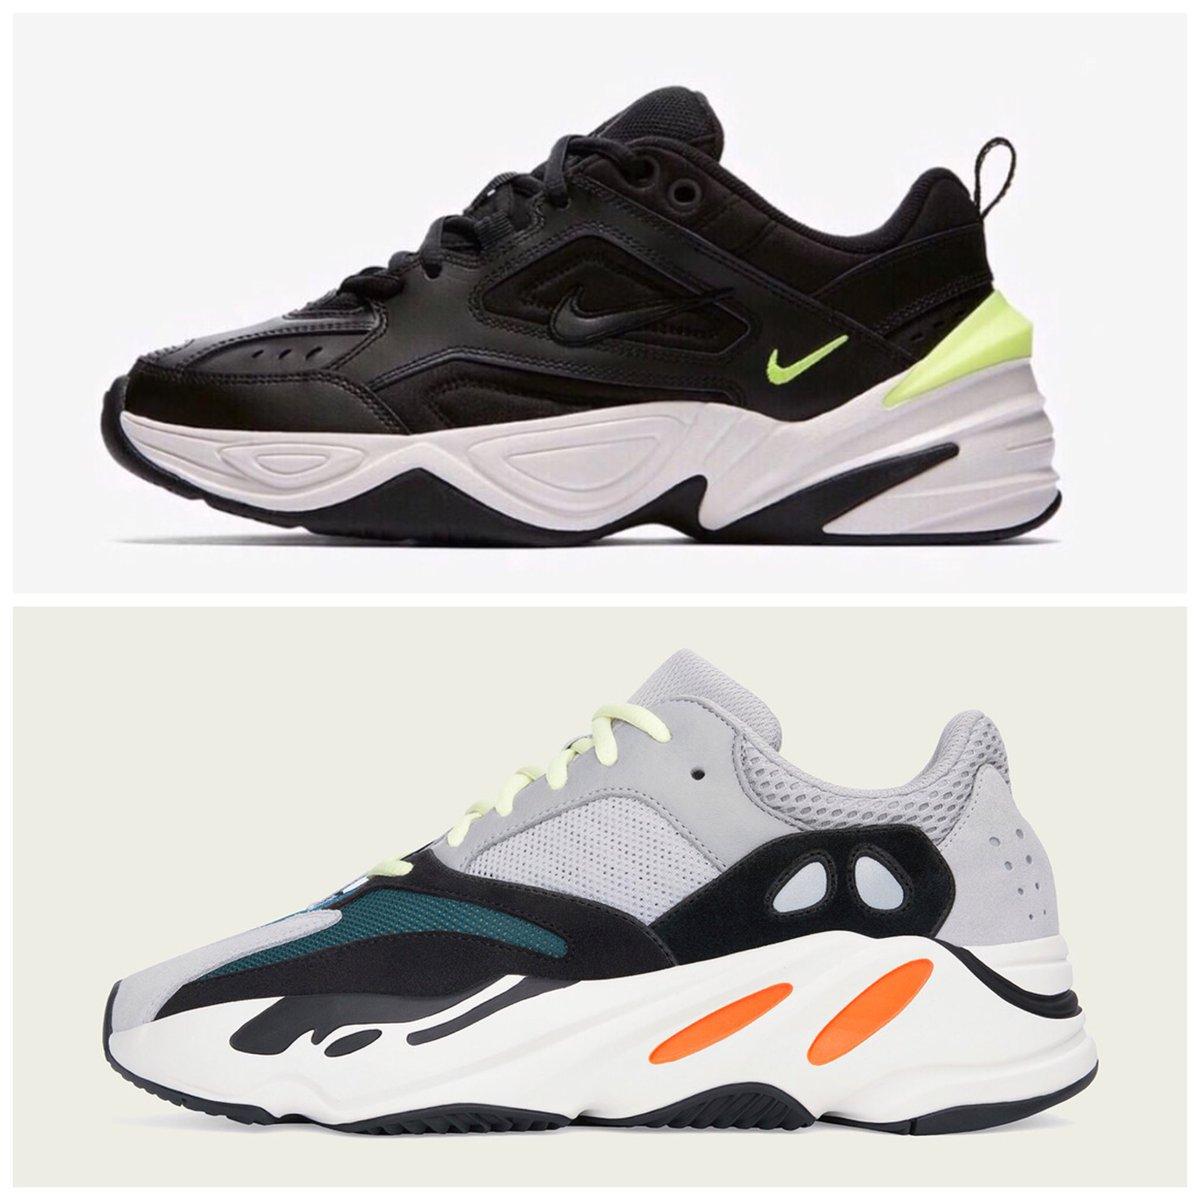 Nike M2K Techno vs Adidas Yeezy Boost